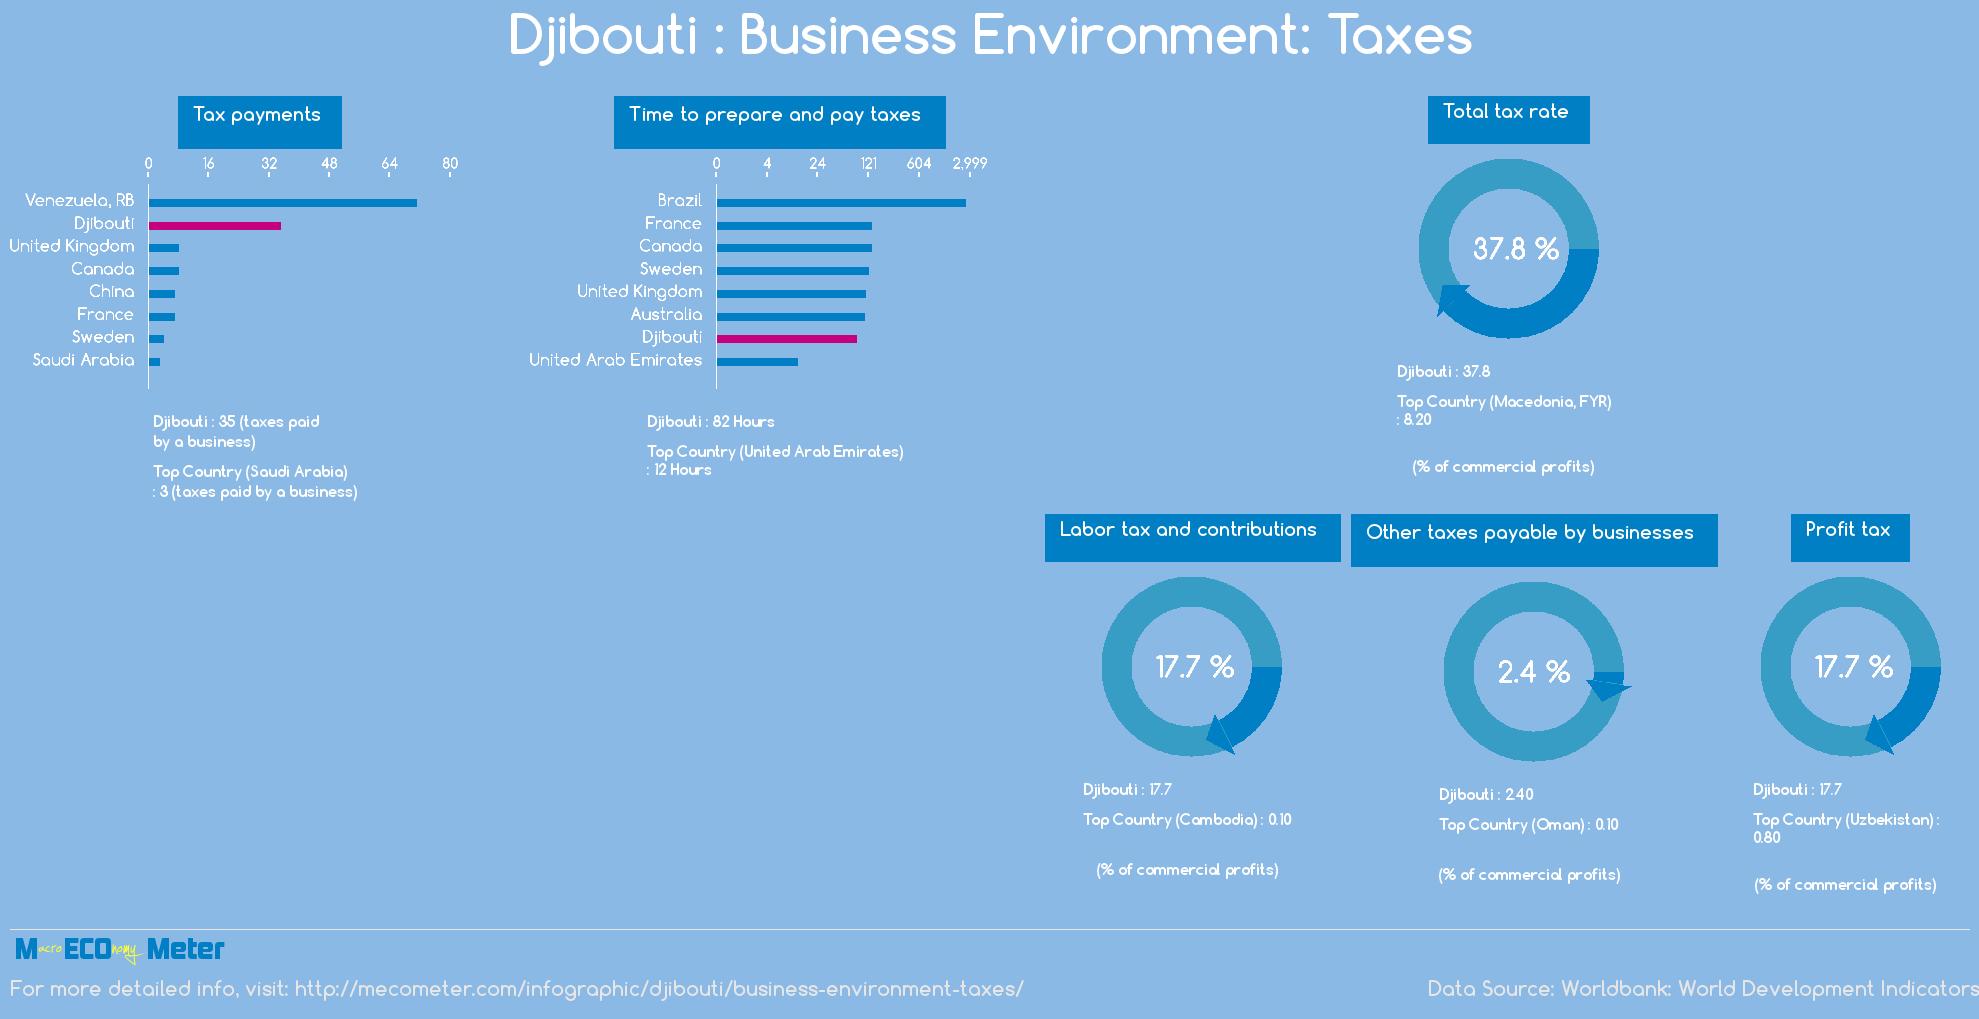 Djibouti : Business Environment: Taxes